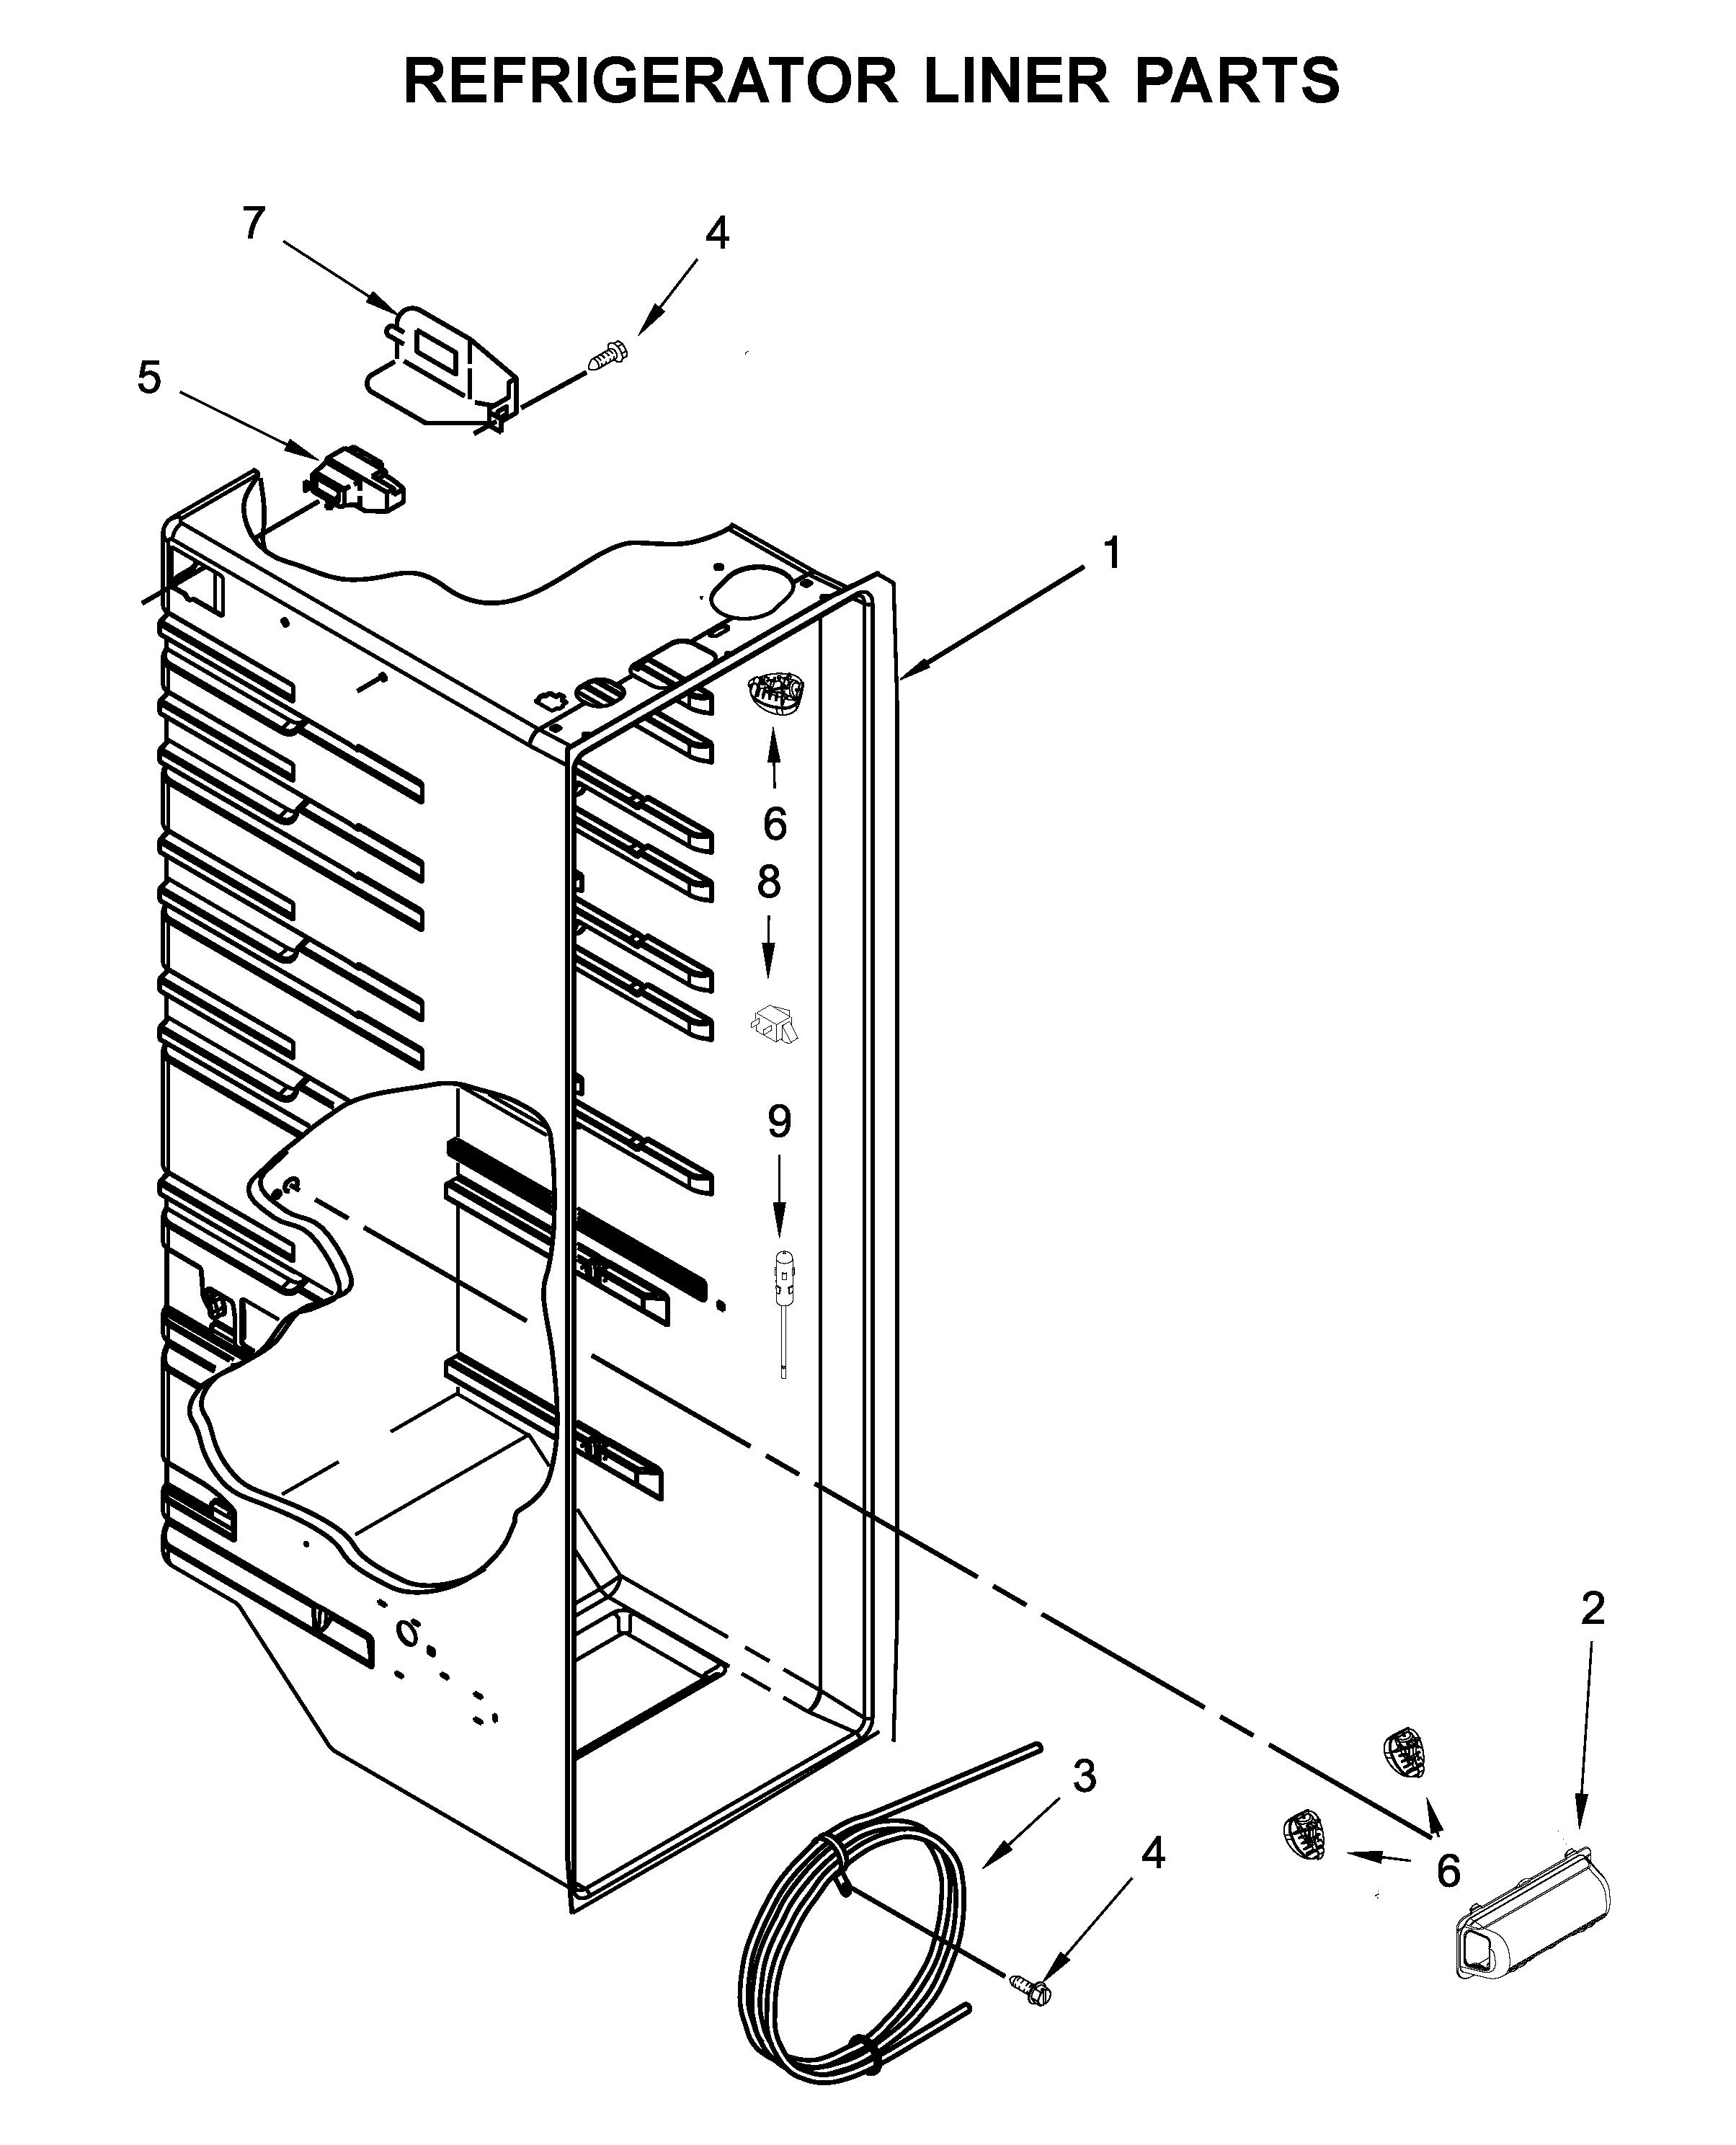 Whirlpool  Refrigerator  Refrigerator liner parts